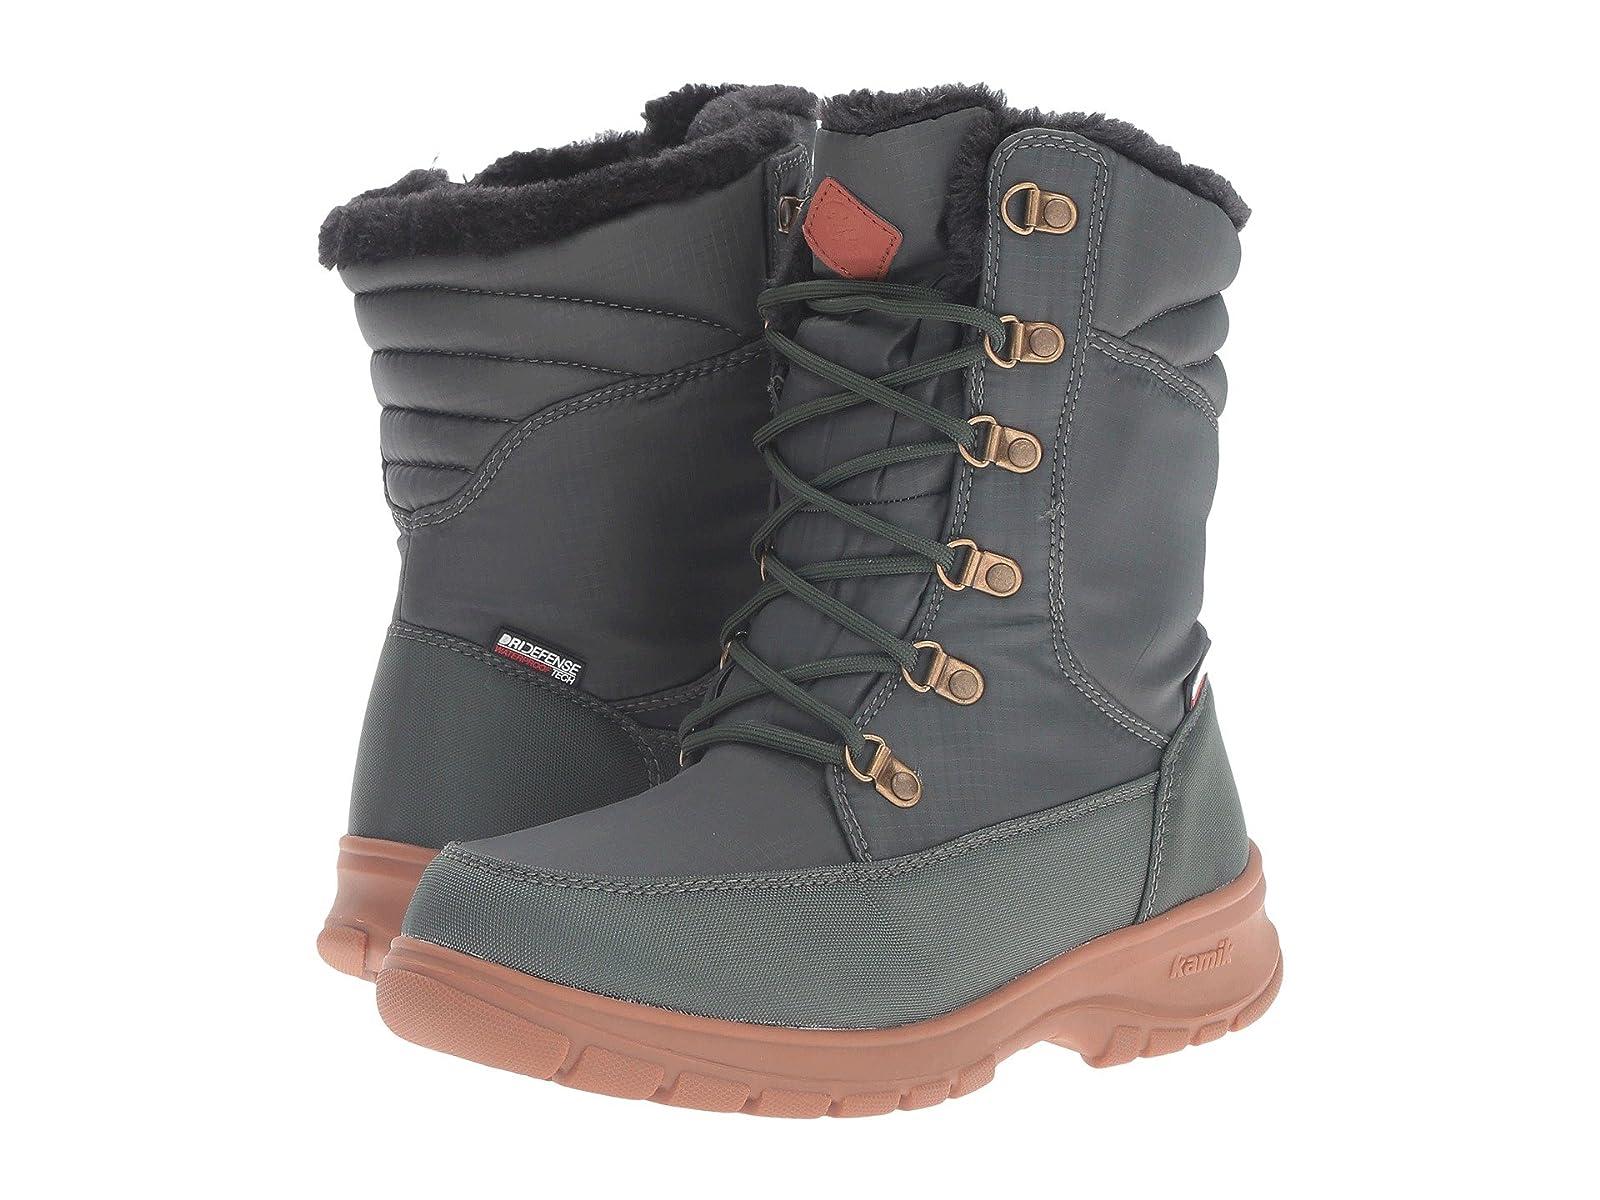 Kamik BronxCheap and distinctive eye-catching shoes